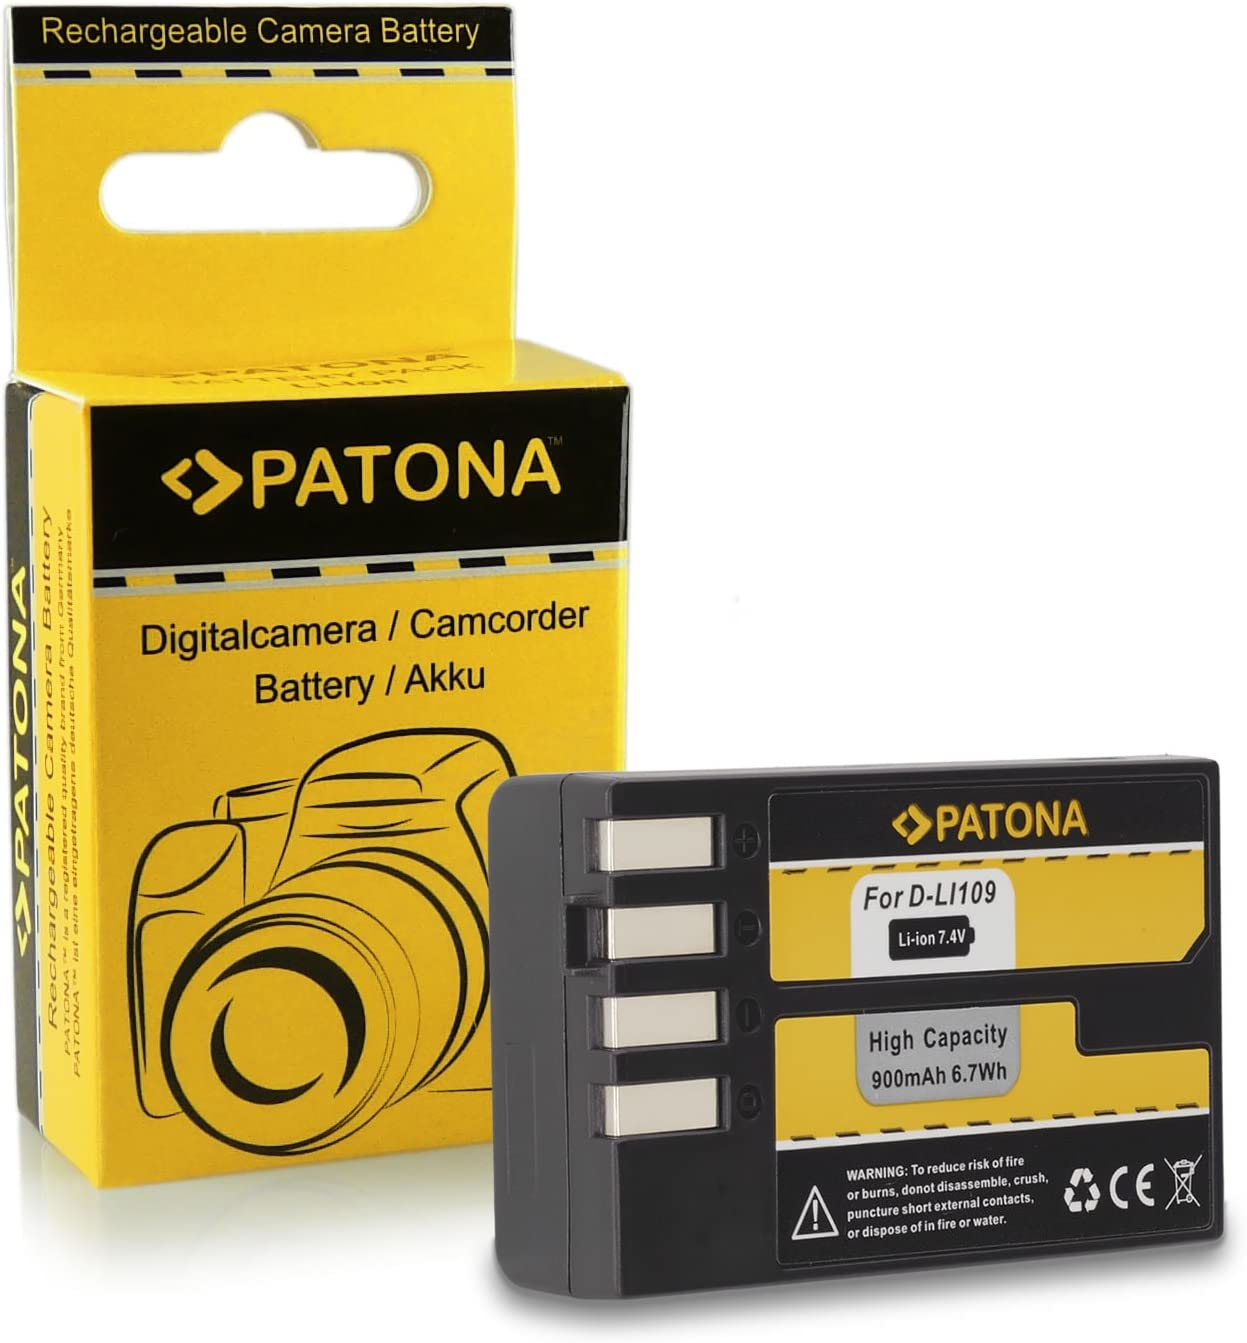 Batteria Patona per Pentax D-Li109,K30,K-50,K-500,K2,K-2,K-R,KR